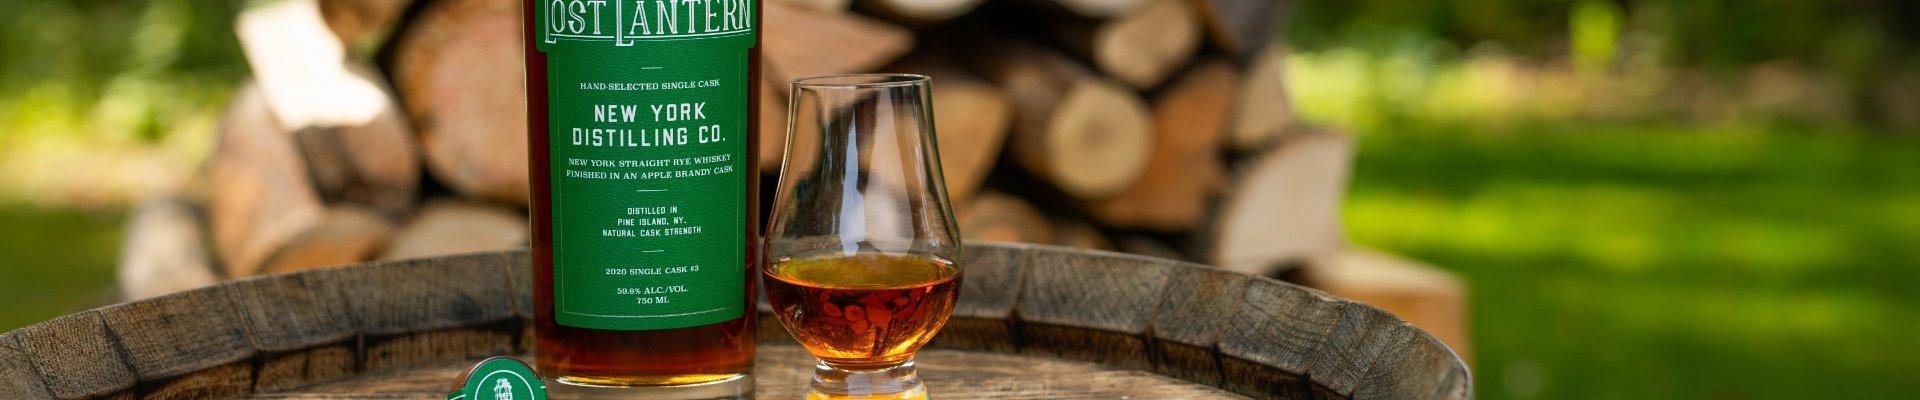 New York Distilling Single Cask #3